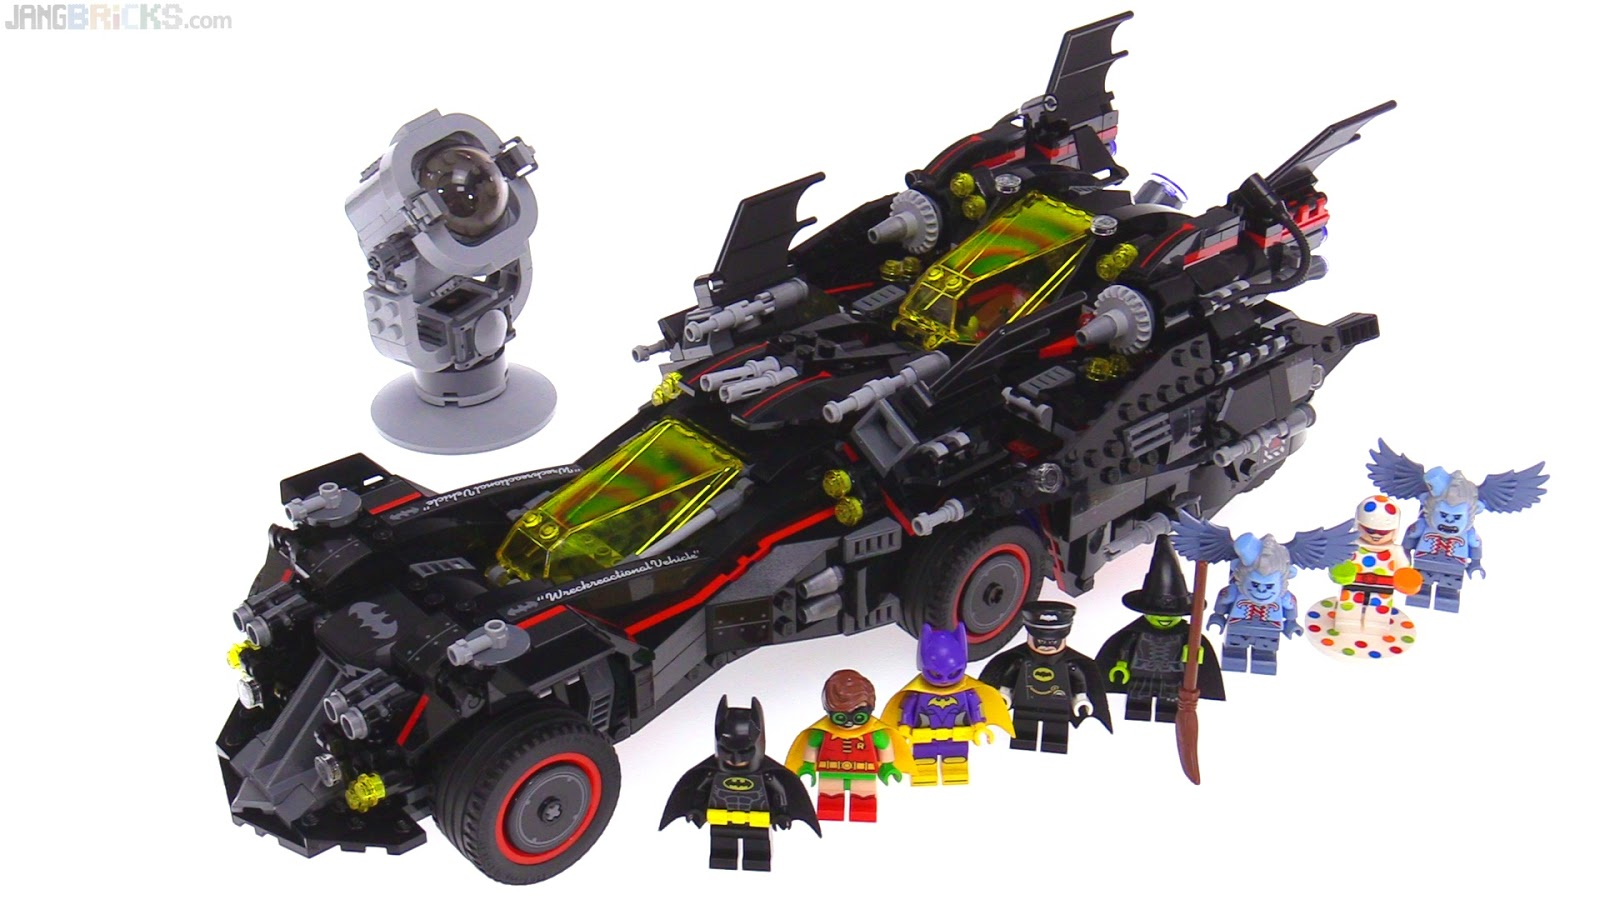 LEGO Batman Movie Ultimate Batmobile build & review videos ...